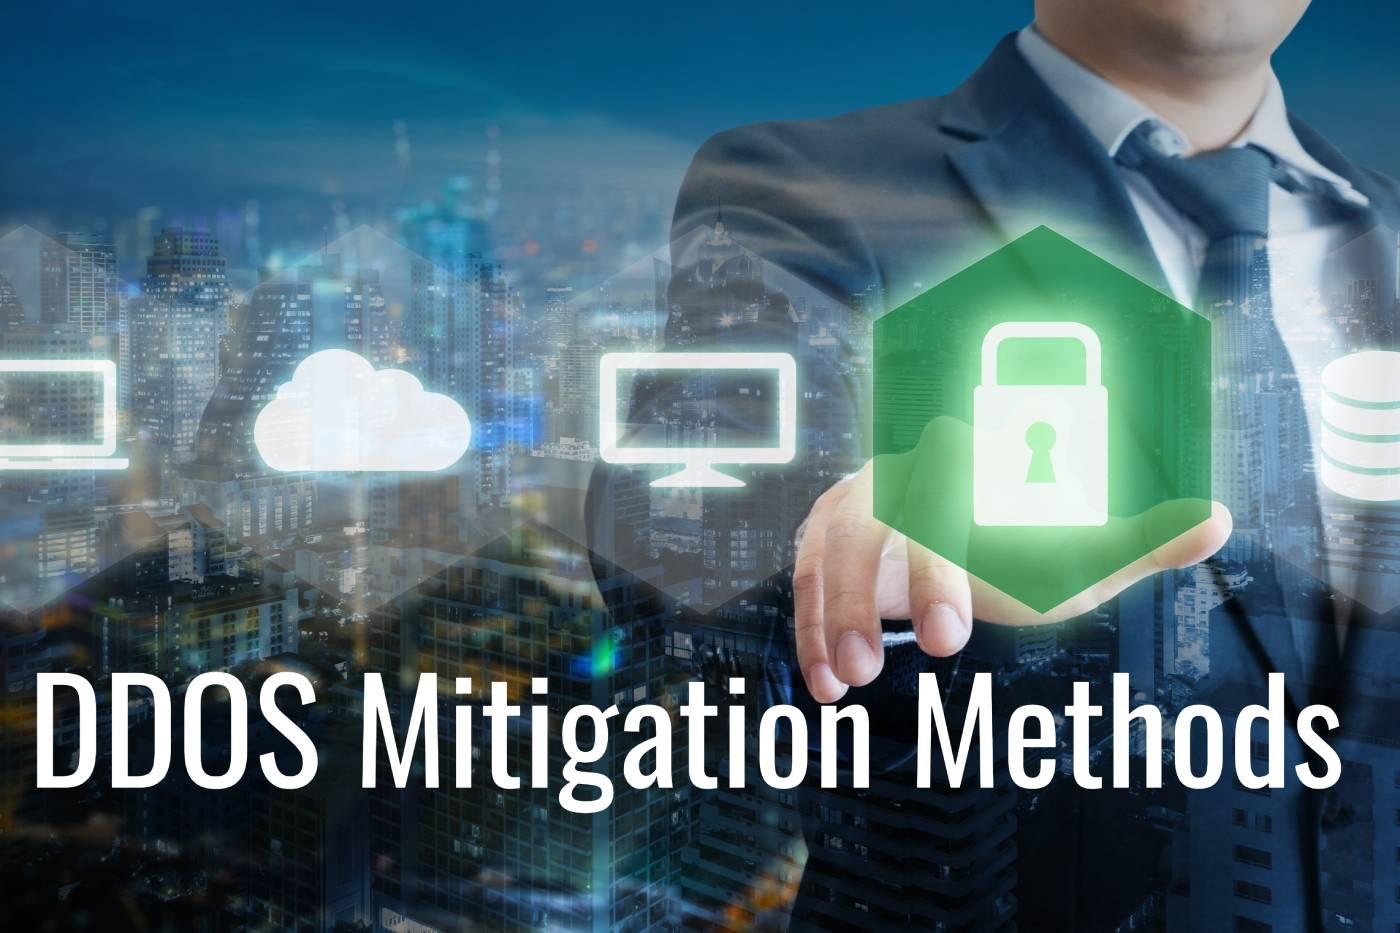 DDoS Mitigation Methods